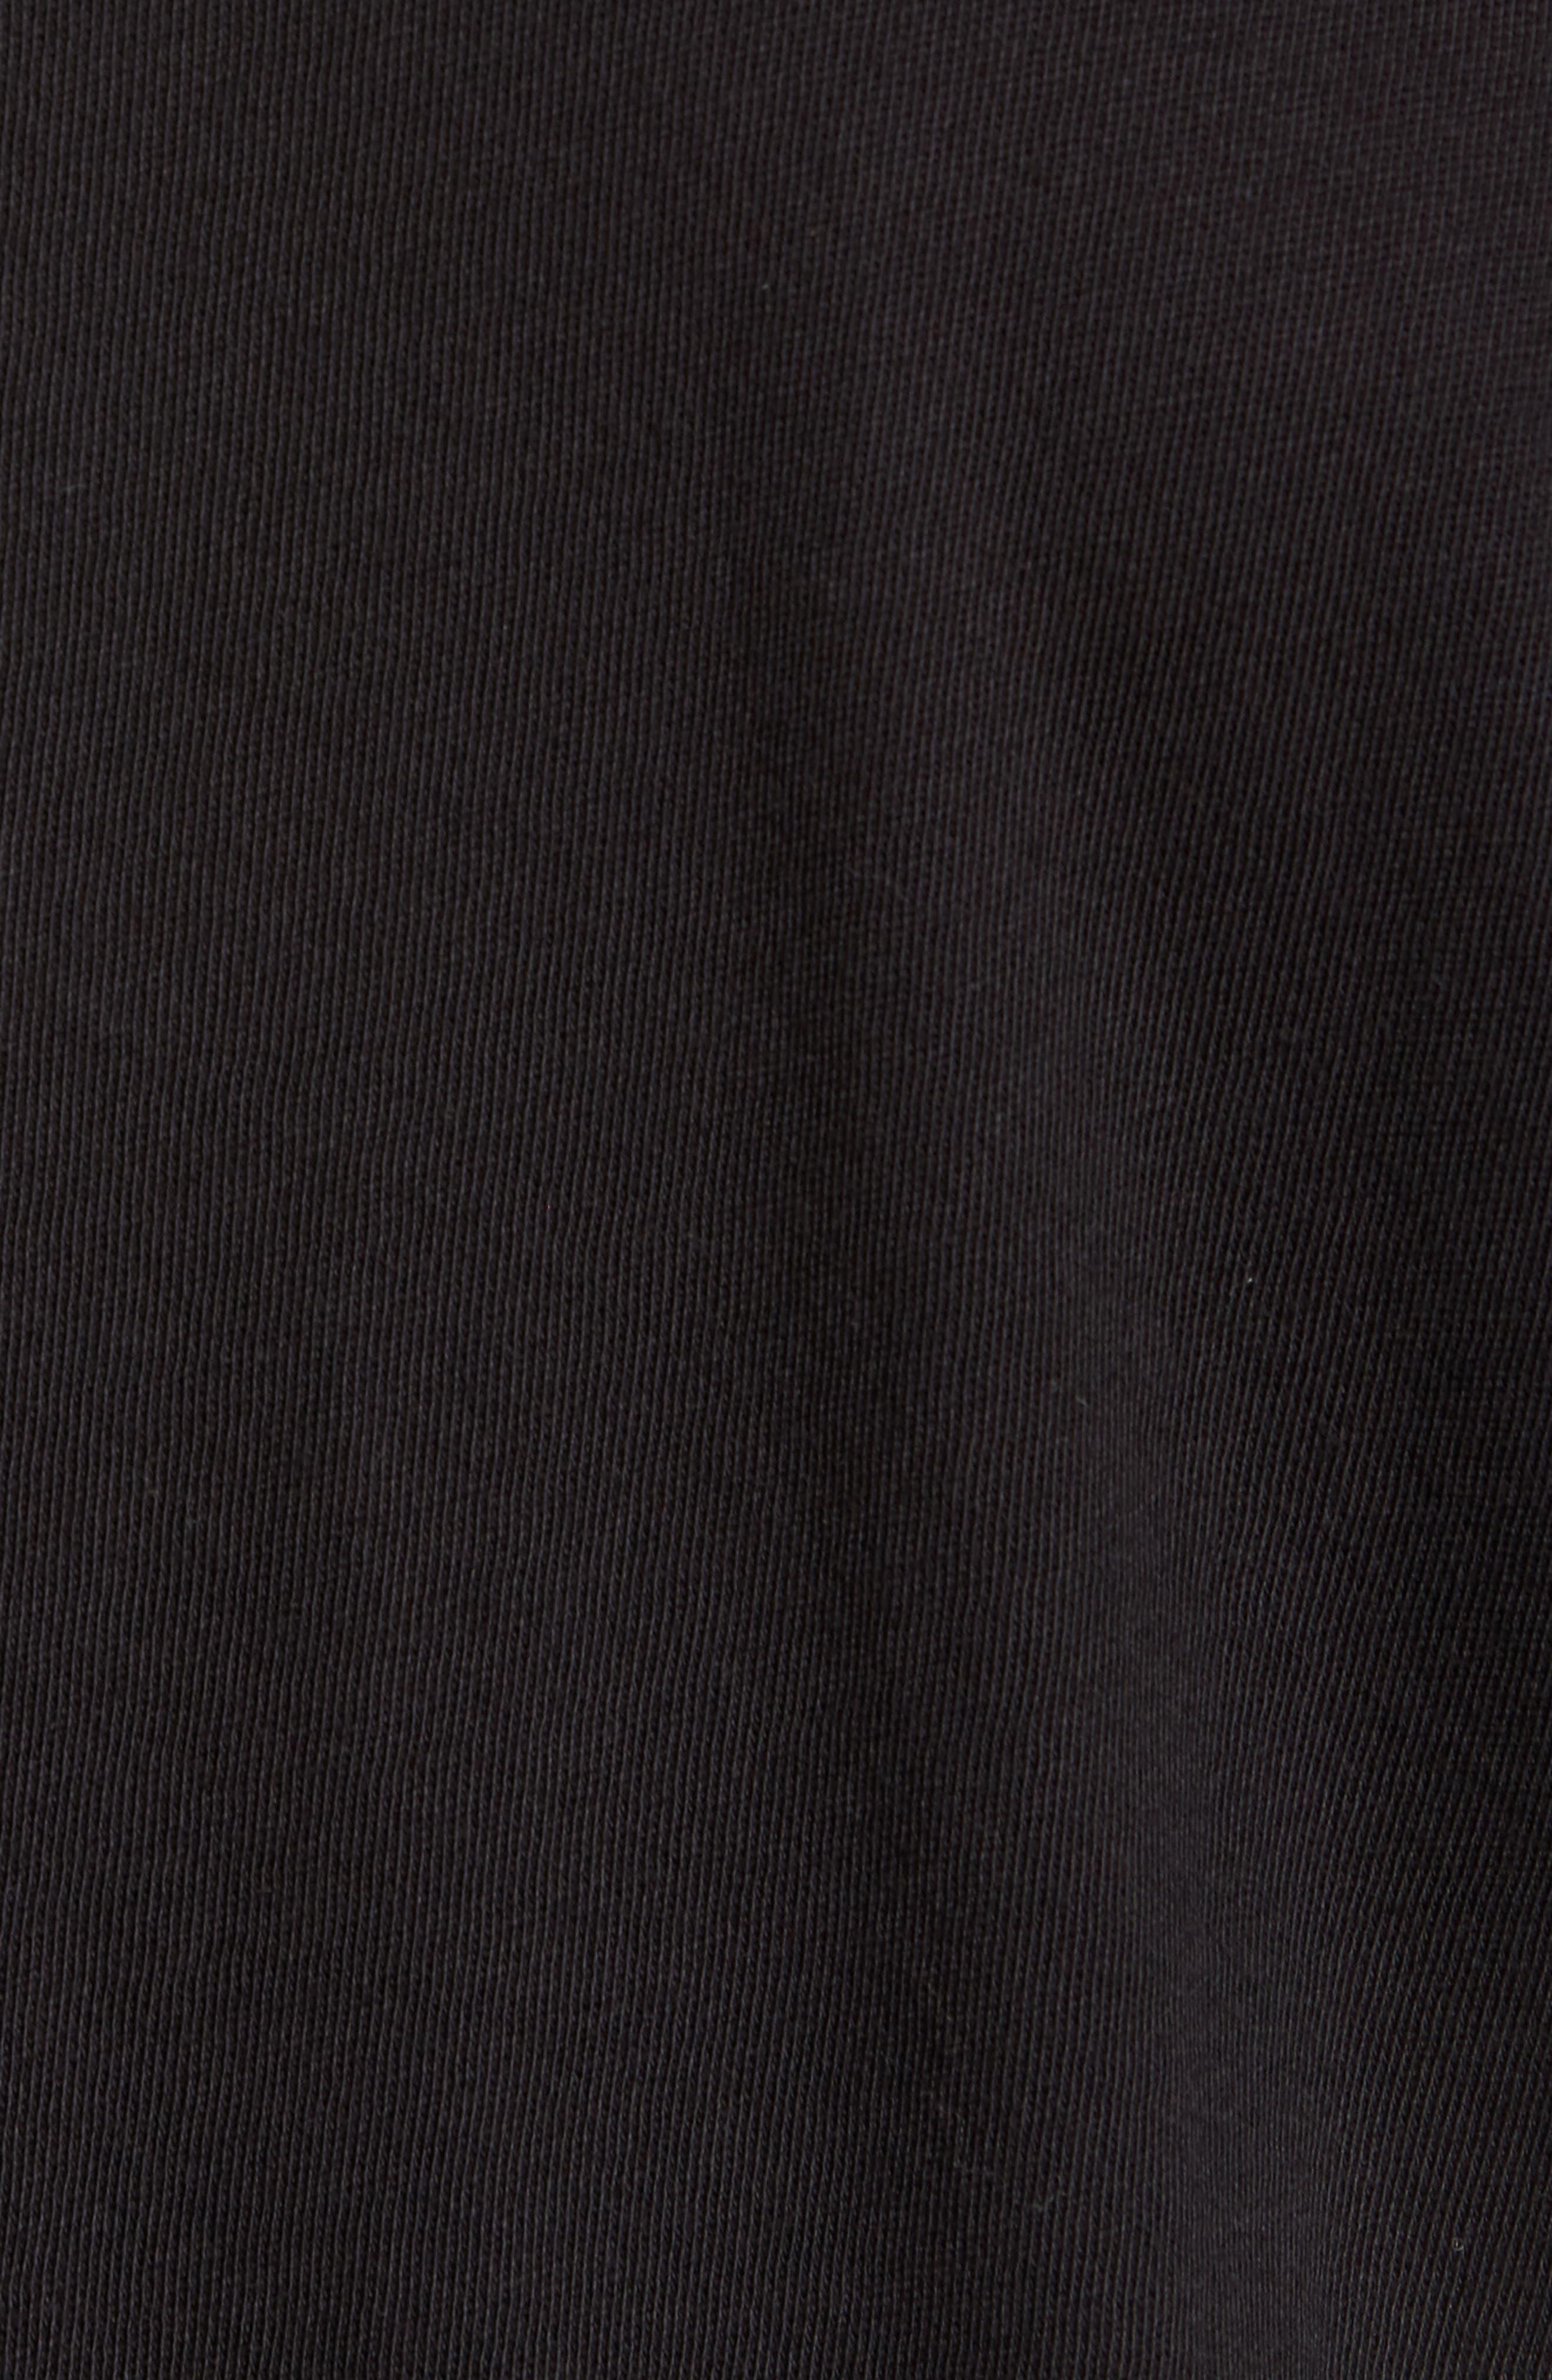 Raw Edge Long Sleeve Henley T-Shirt,                             Alternate thumbnail 5, color,                             001